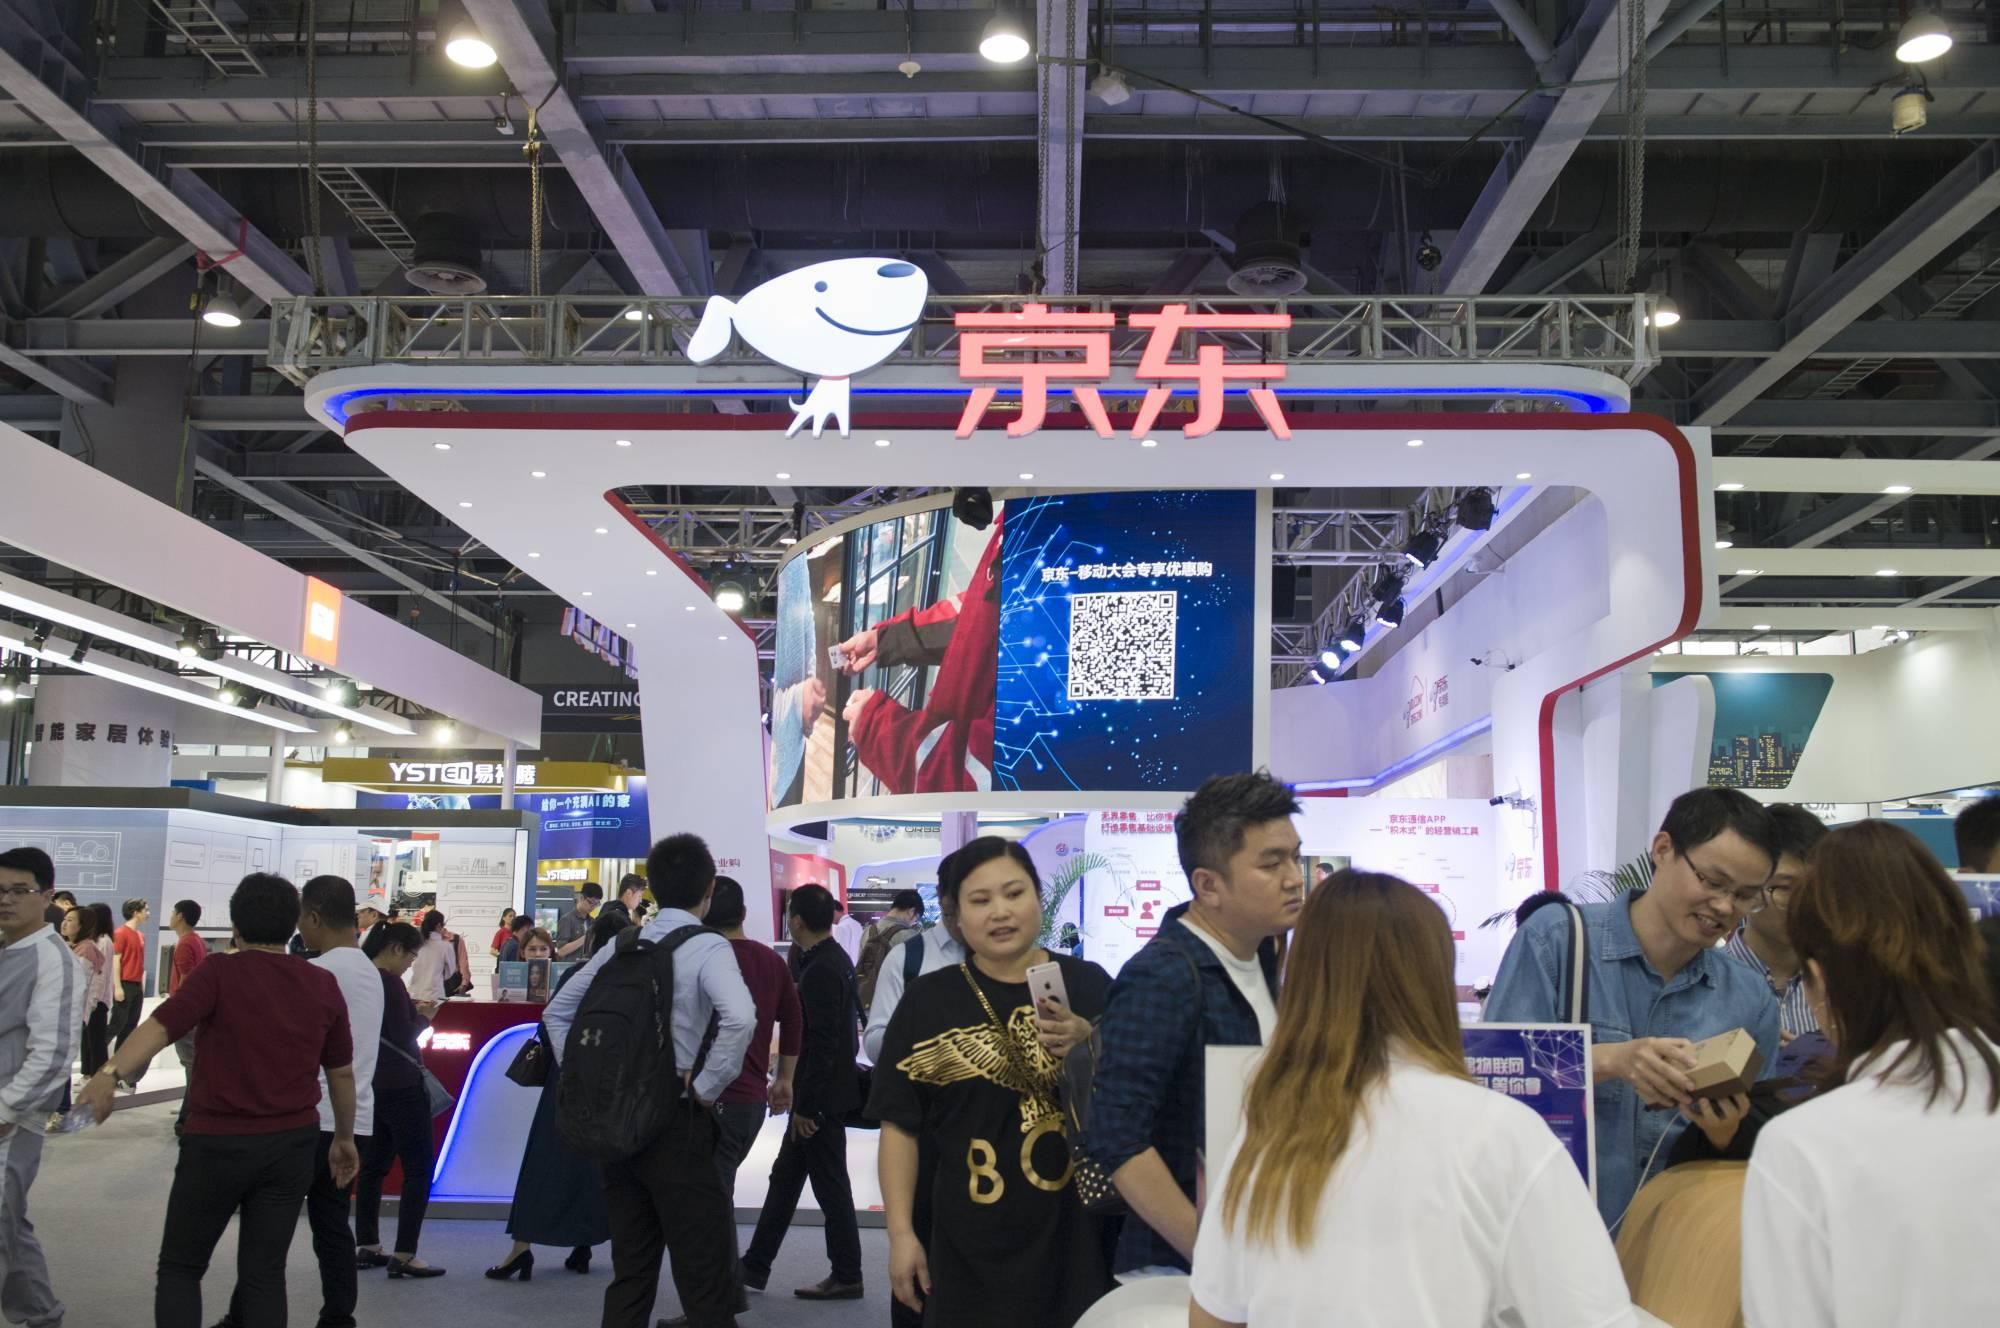 China Mobile Global Partner Conference 2018